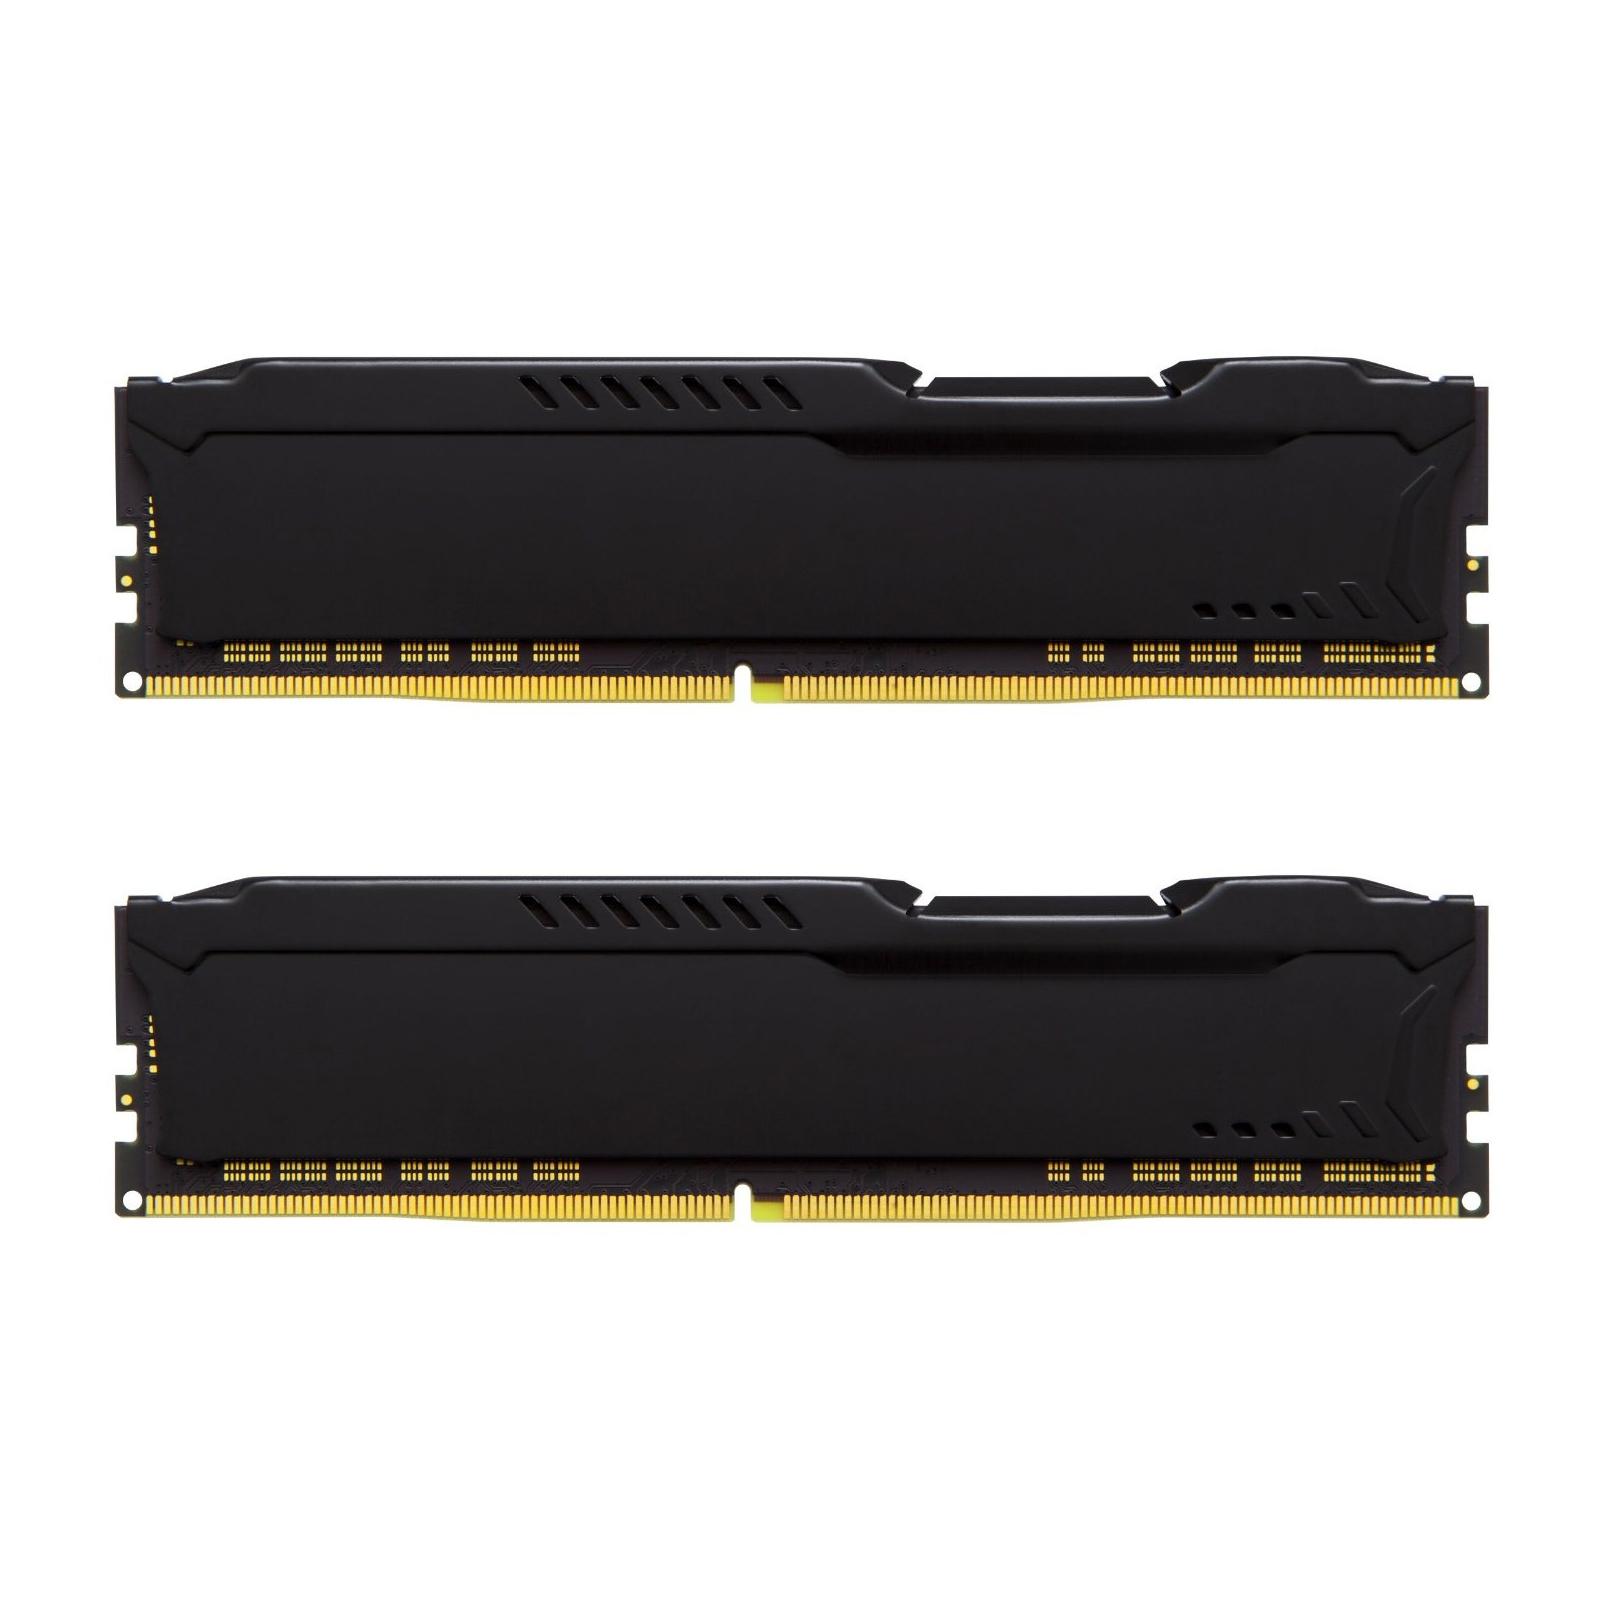 Модуль памяти для компьютера DDR4 16GB (2x8GB) 2400 MHz HyperX FURY Black Kingston (HX424C15FB2K2/16) изображение 3